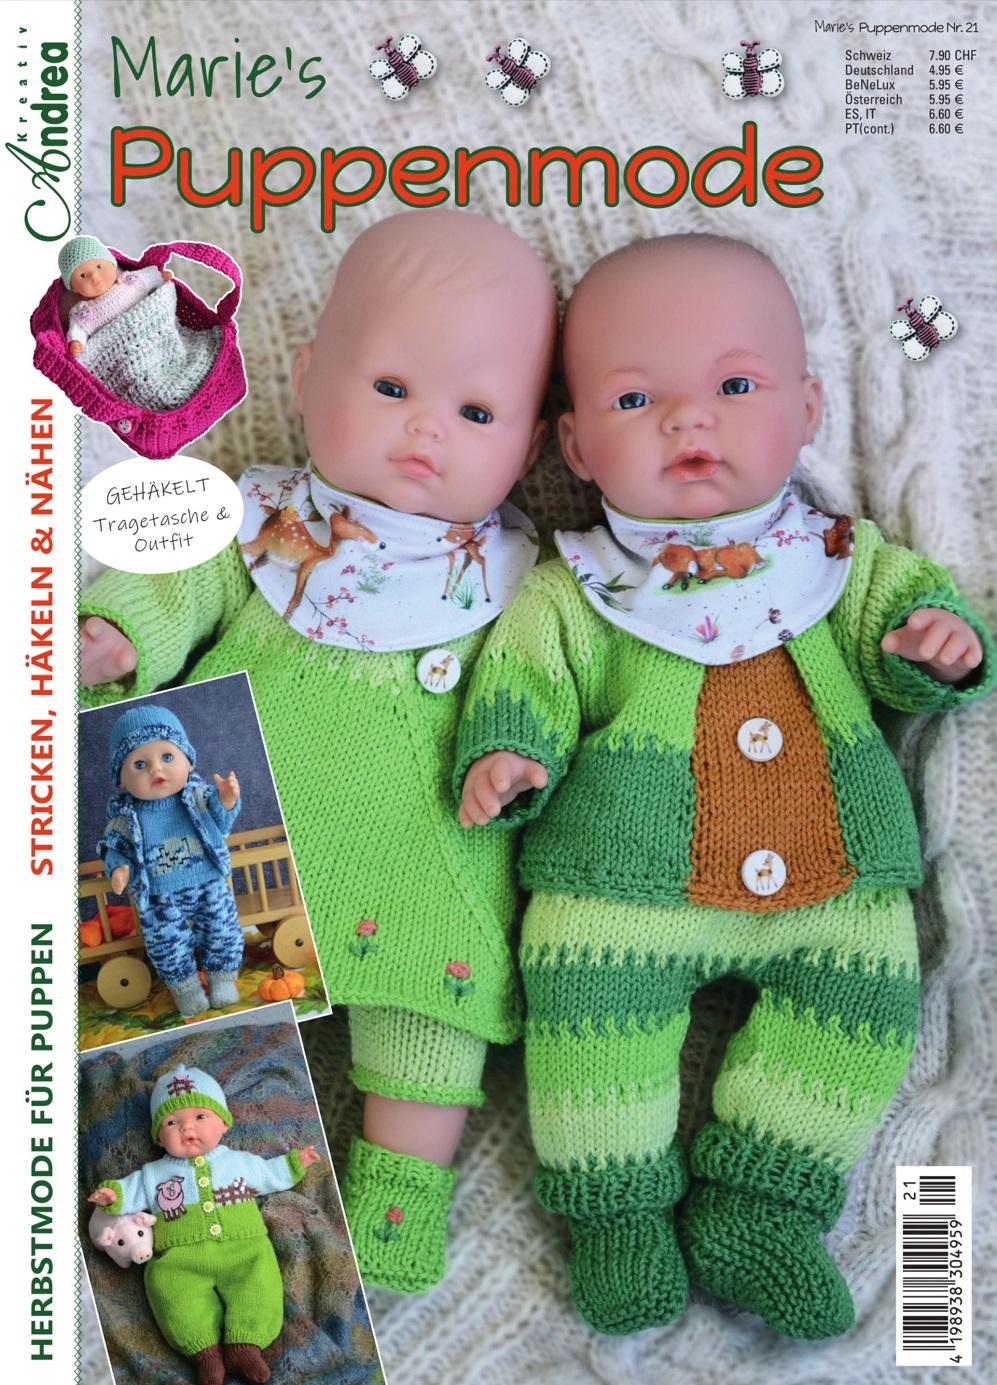 Журнал по вязанию для кукол «Marie's Puppenmode» №21 2020